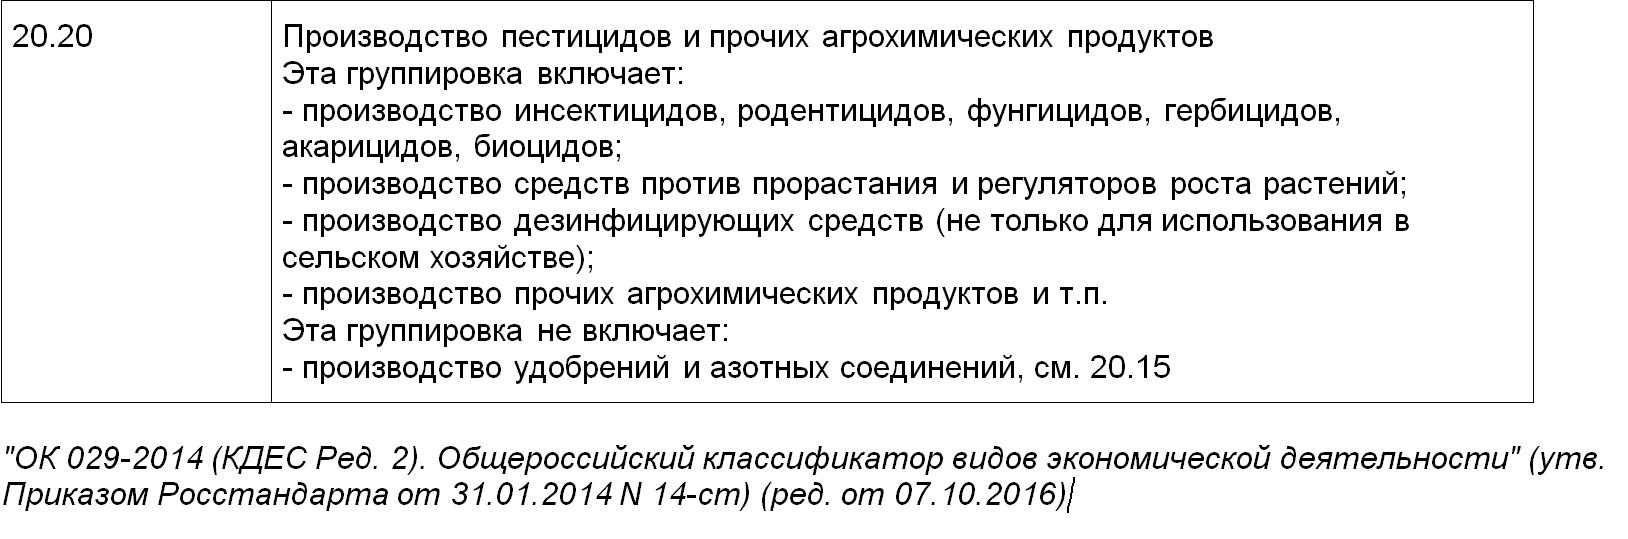 Расшифровка ОКВЭД 20.20